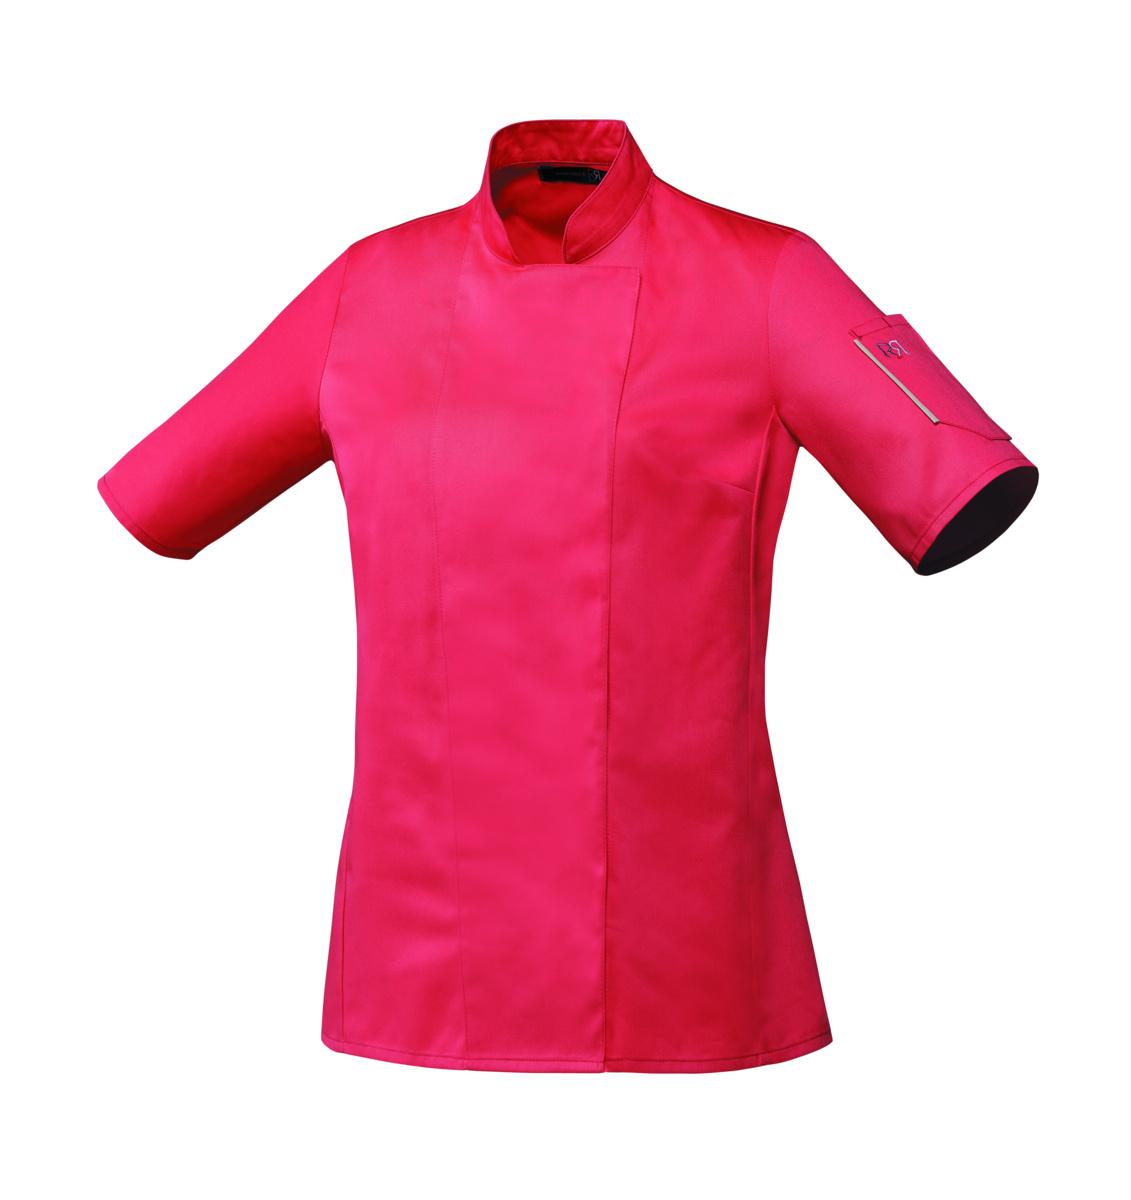 Veste femme rose taille 0 Unera Robur